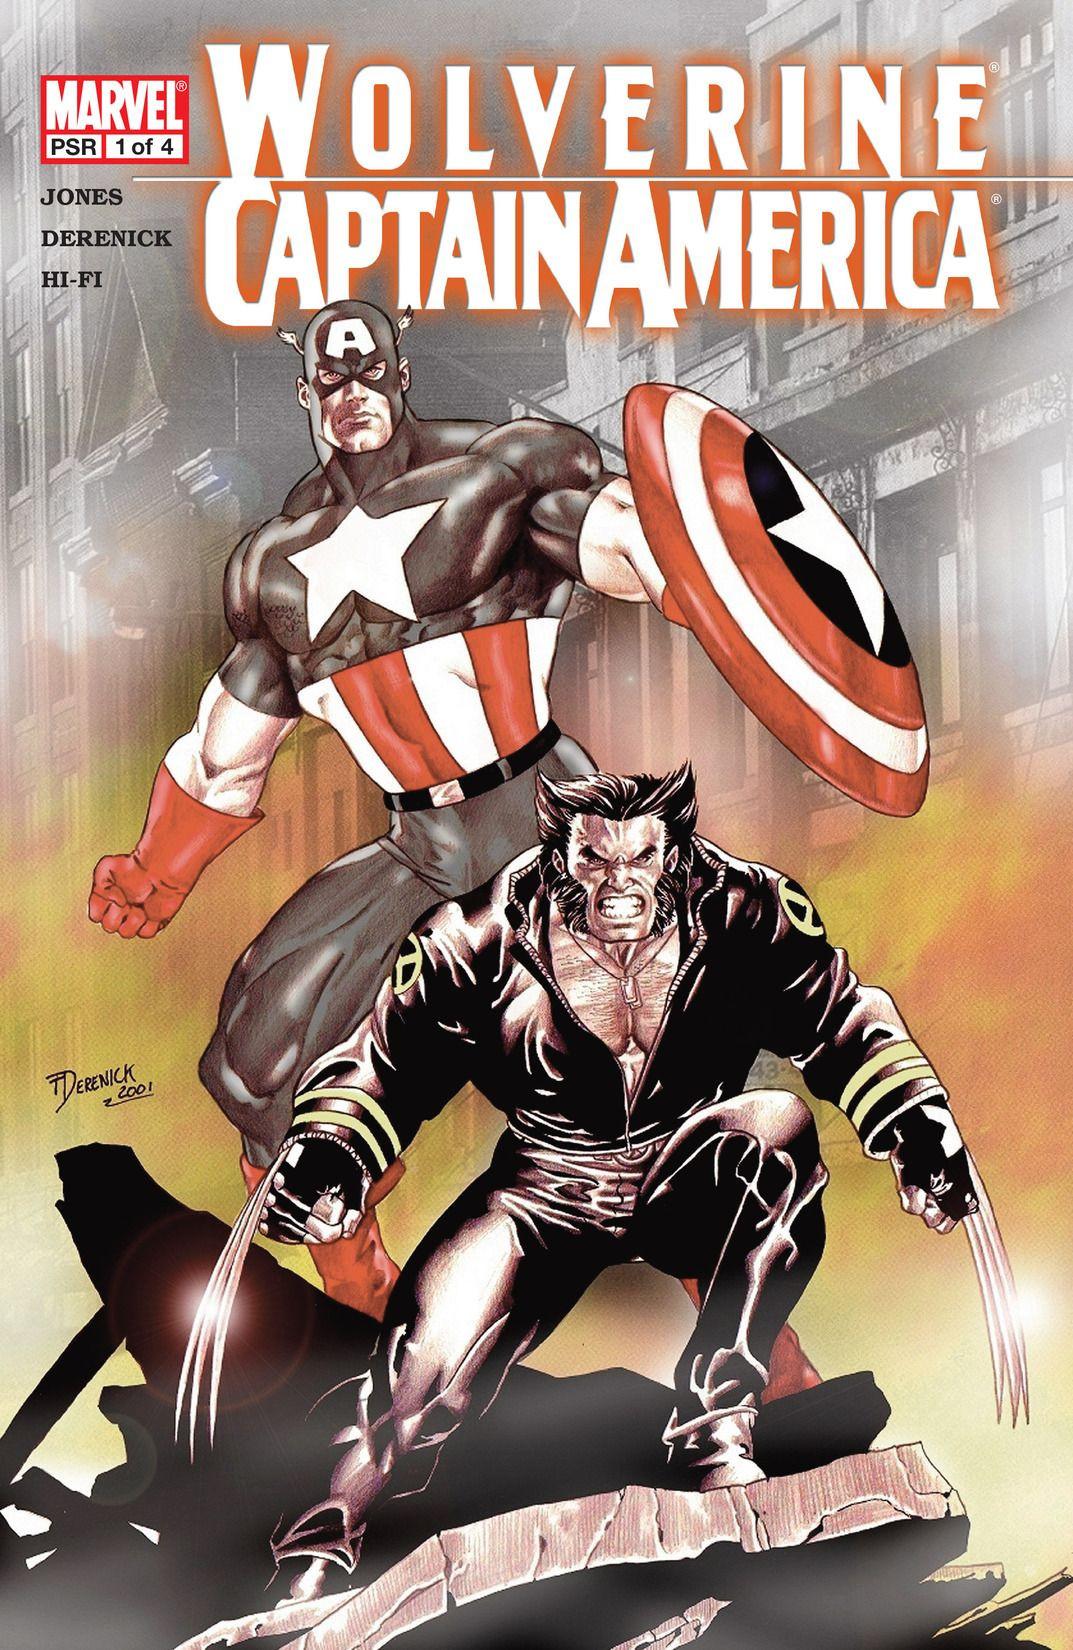 Wolverine/Captain America Vol 1 1